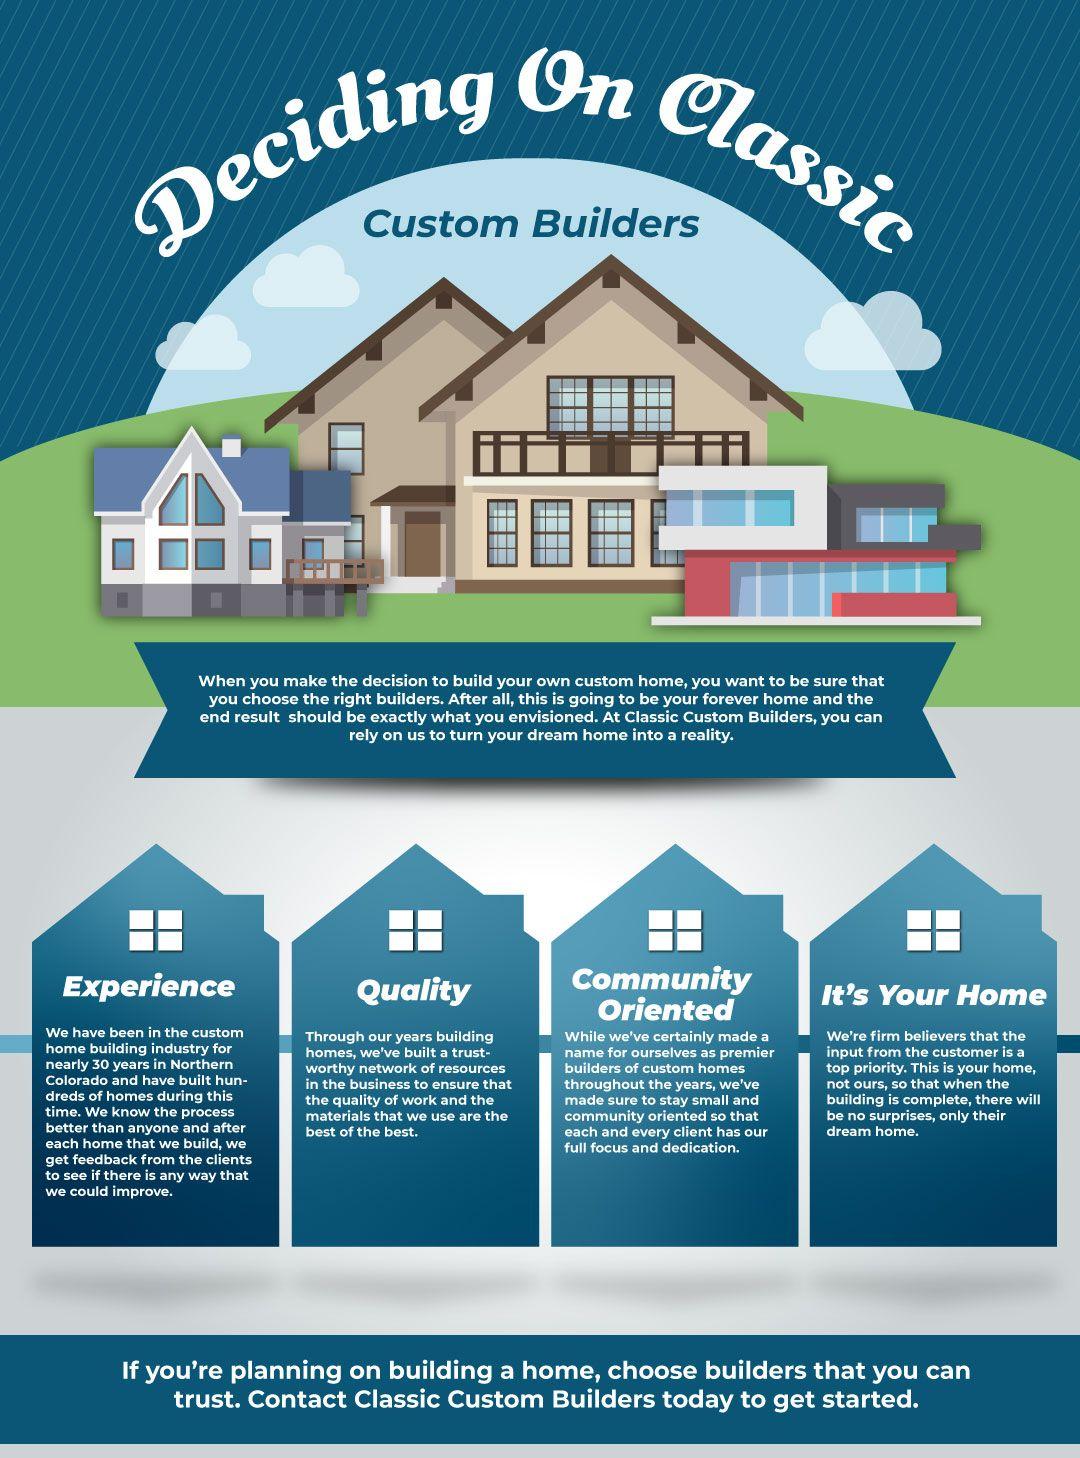 Deciding-On-Classic-Custom-Builders-5be36498d8b89.jpg